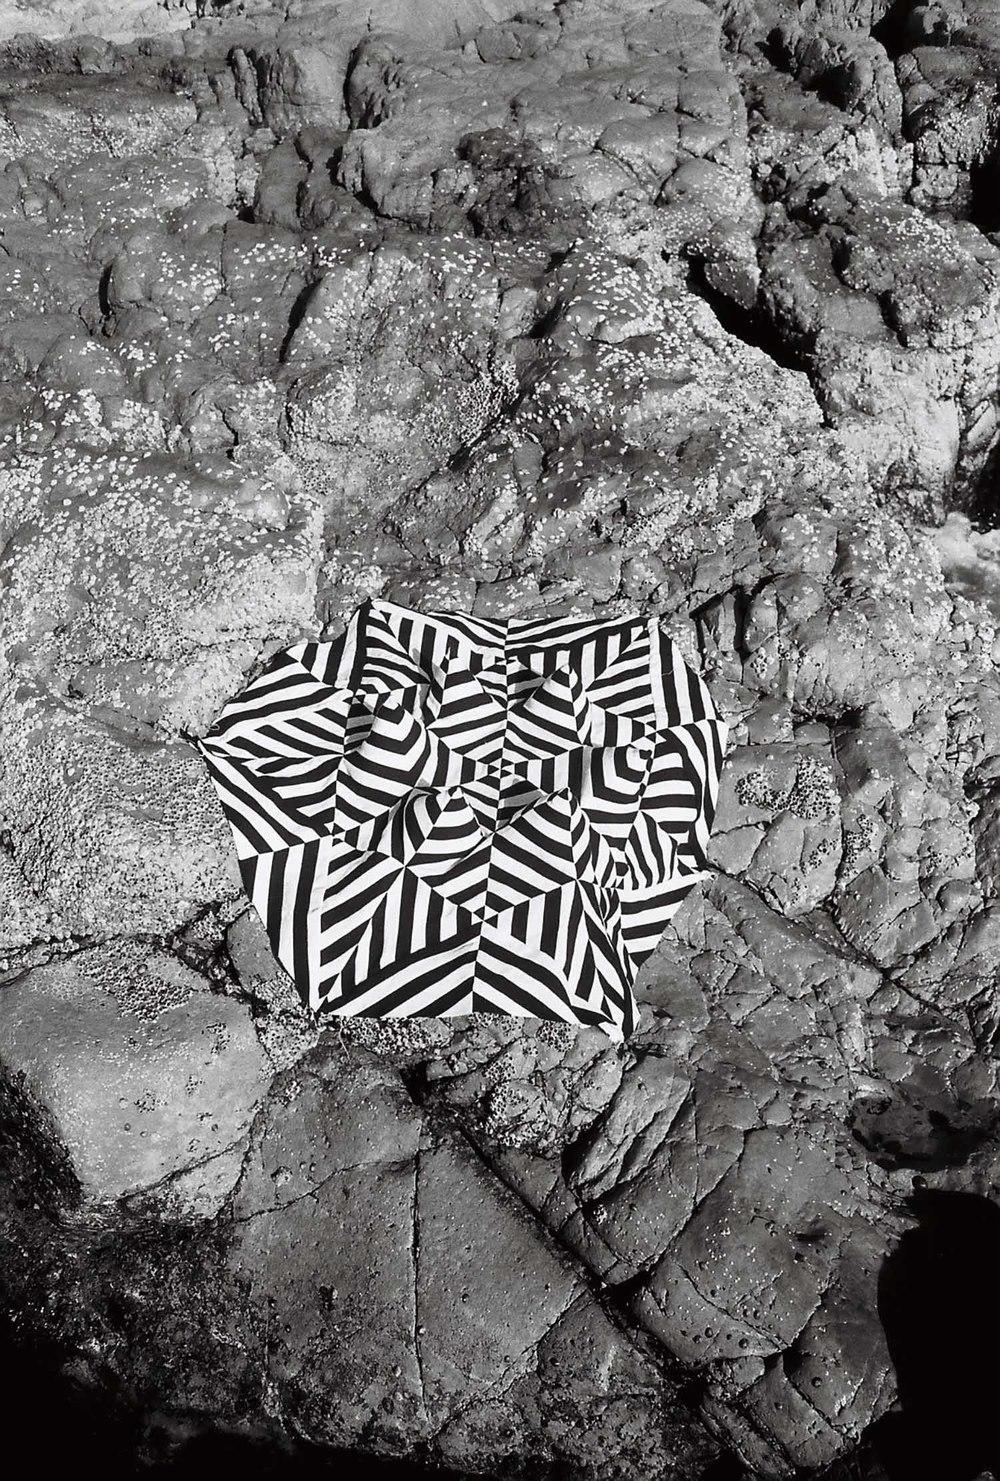 Illusion Quilt at Coolum Beach, 2016, 35mm print (photo Rhett Wyman)